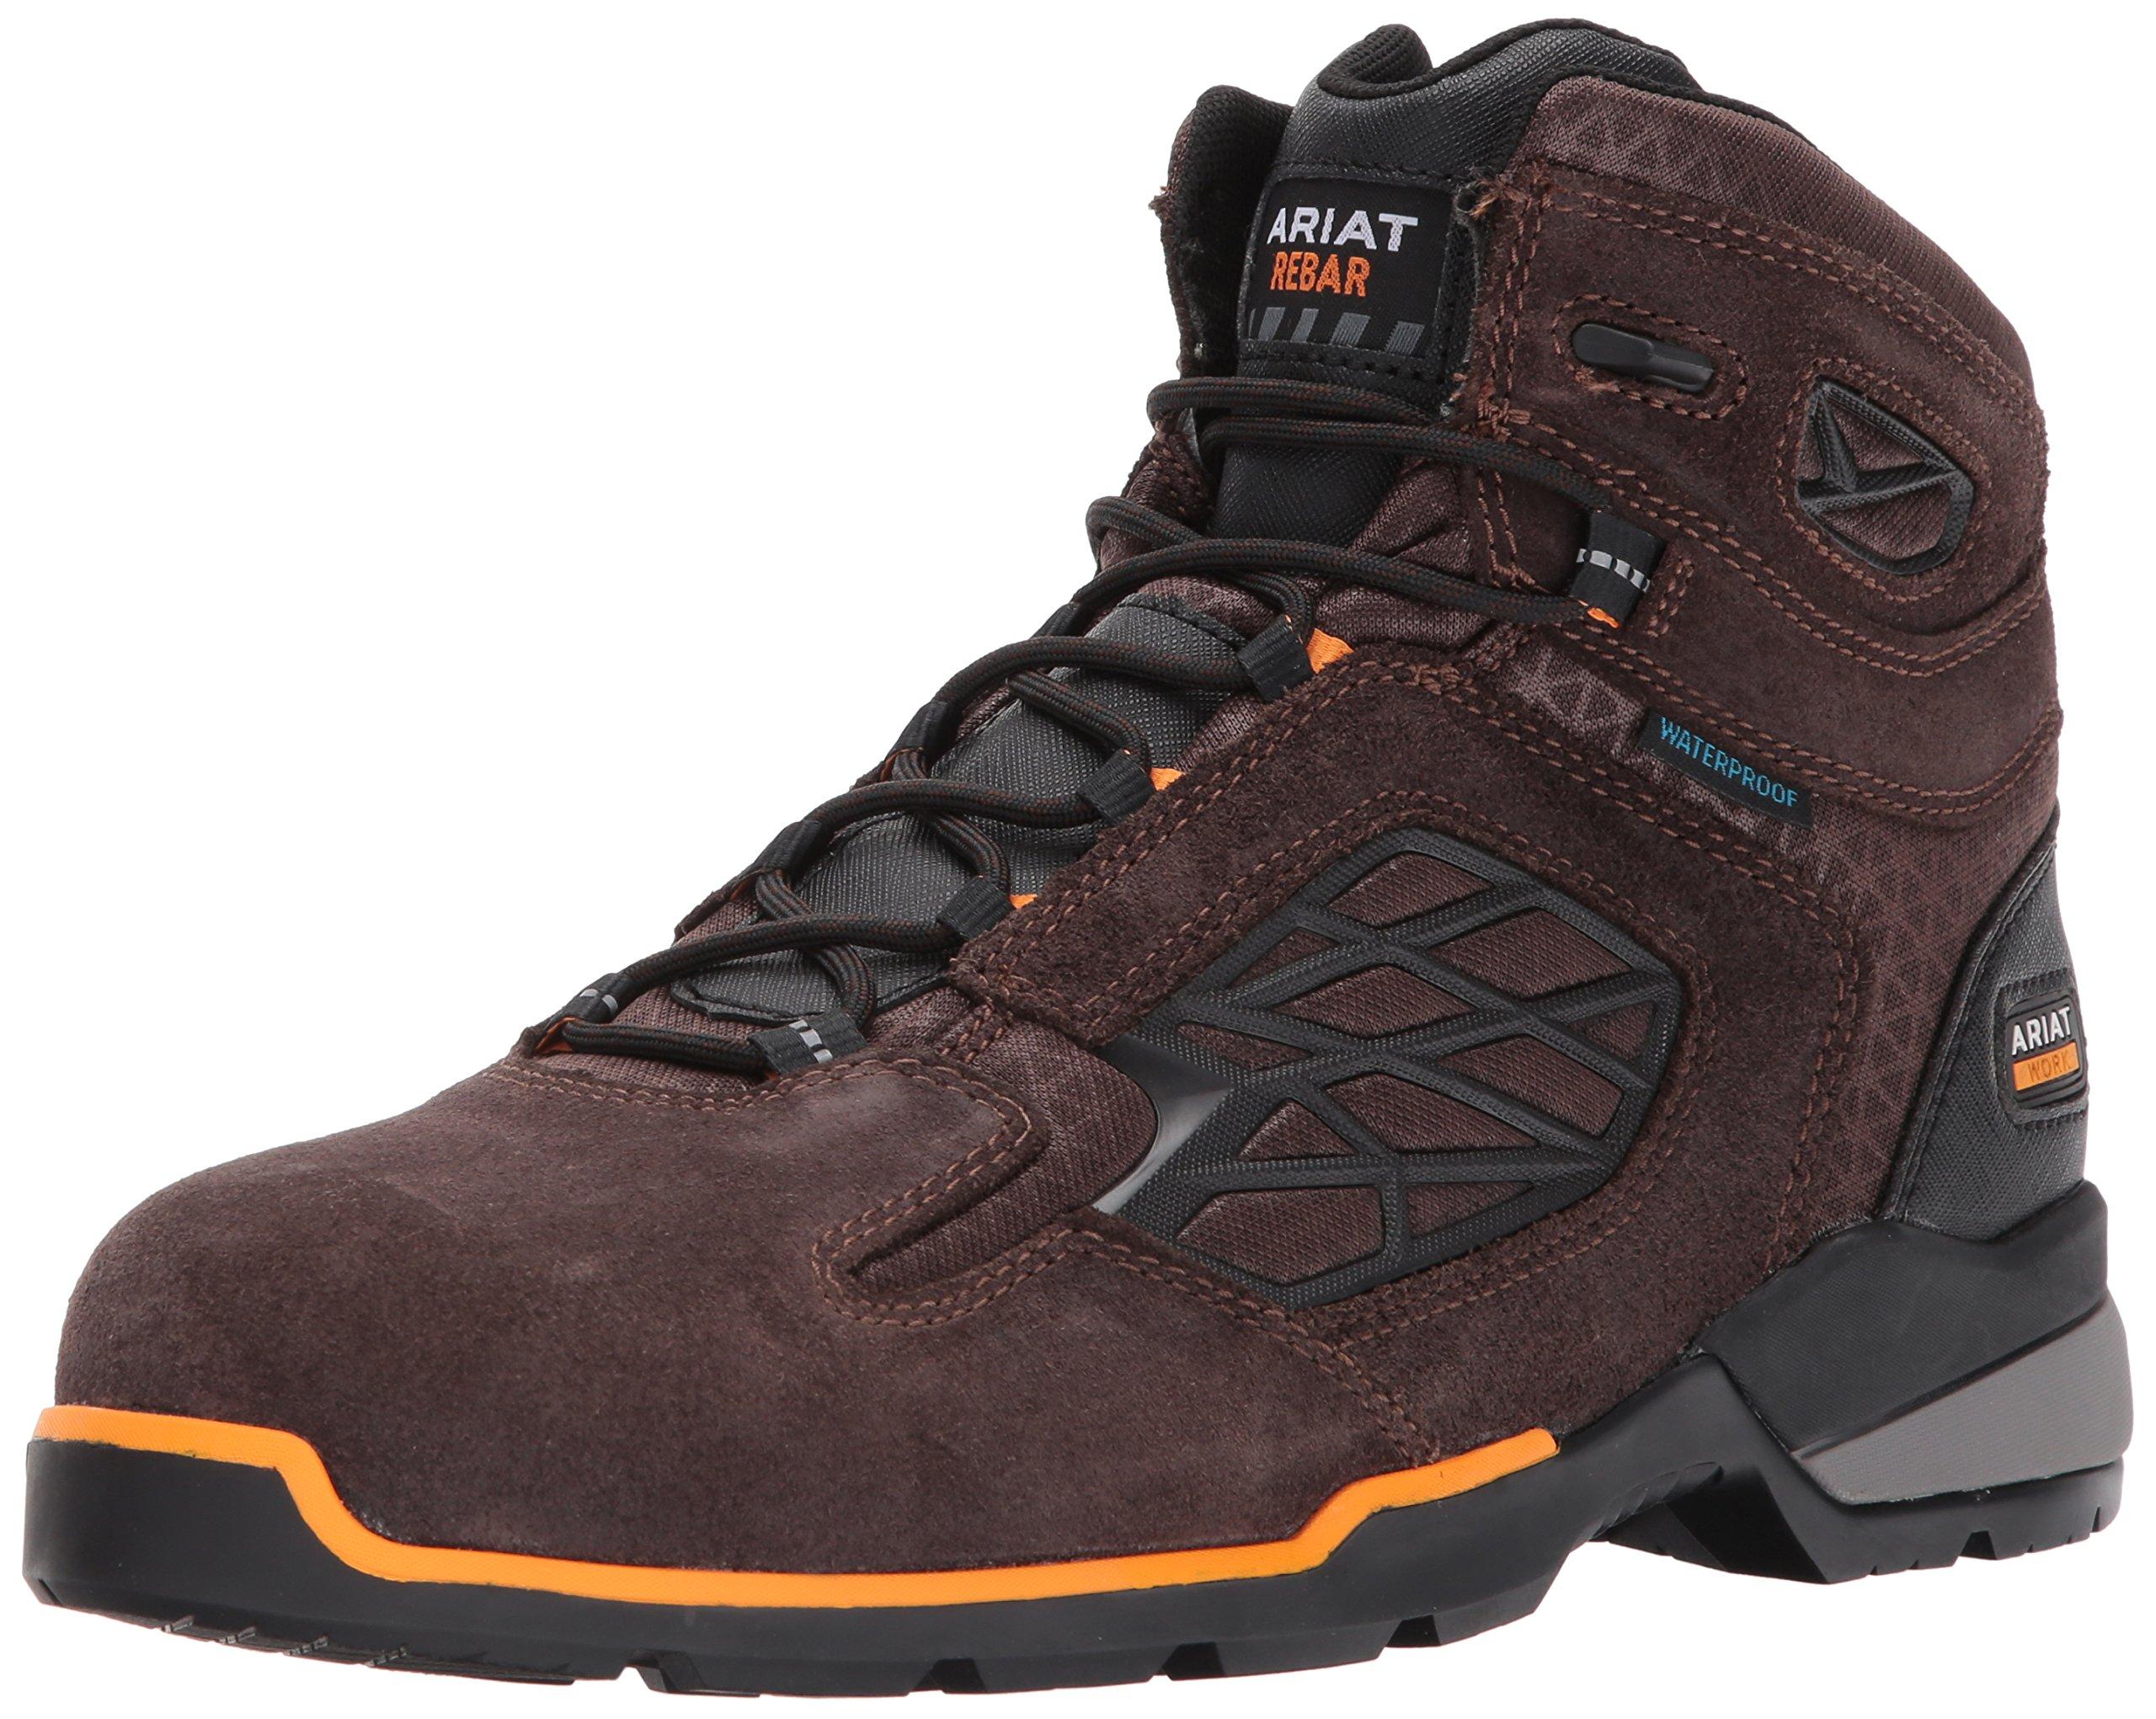 Ariat Work Men's Rebar Flex 6'' H2O Composite Toe Work Boot, Chocolate Brown, 12 E US